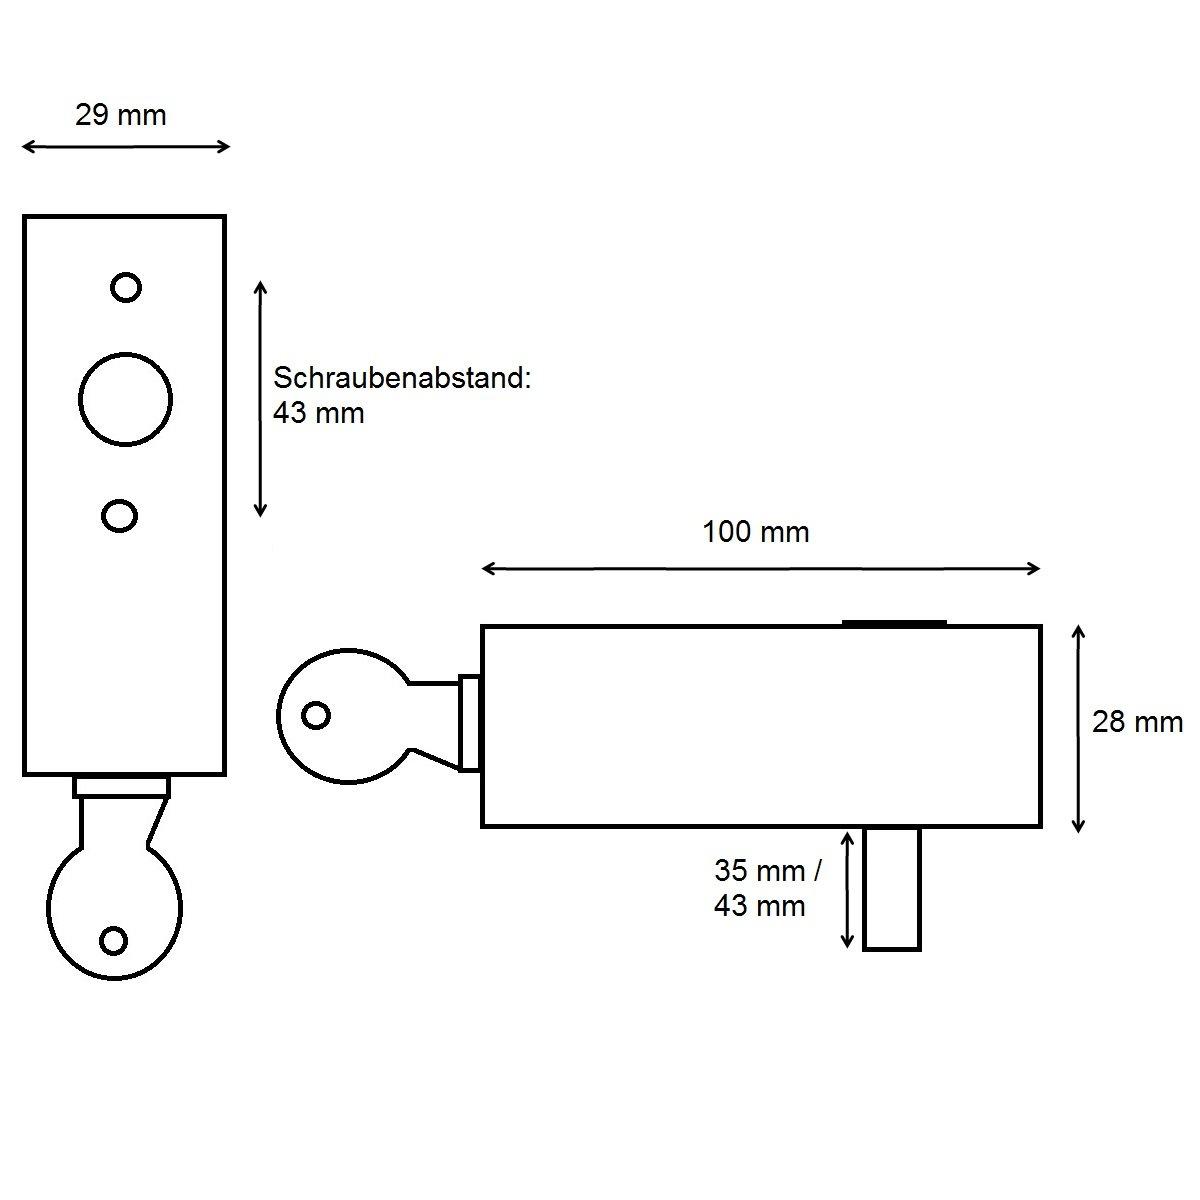 Bauhaus Edelstahl poliert Abschlie/ßbarer Fenstergriff 43 mm Stiftl/änge 35 mm